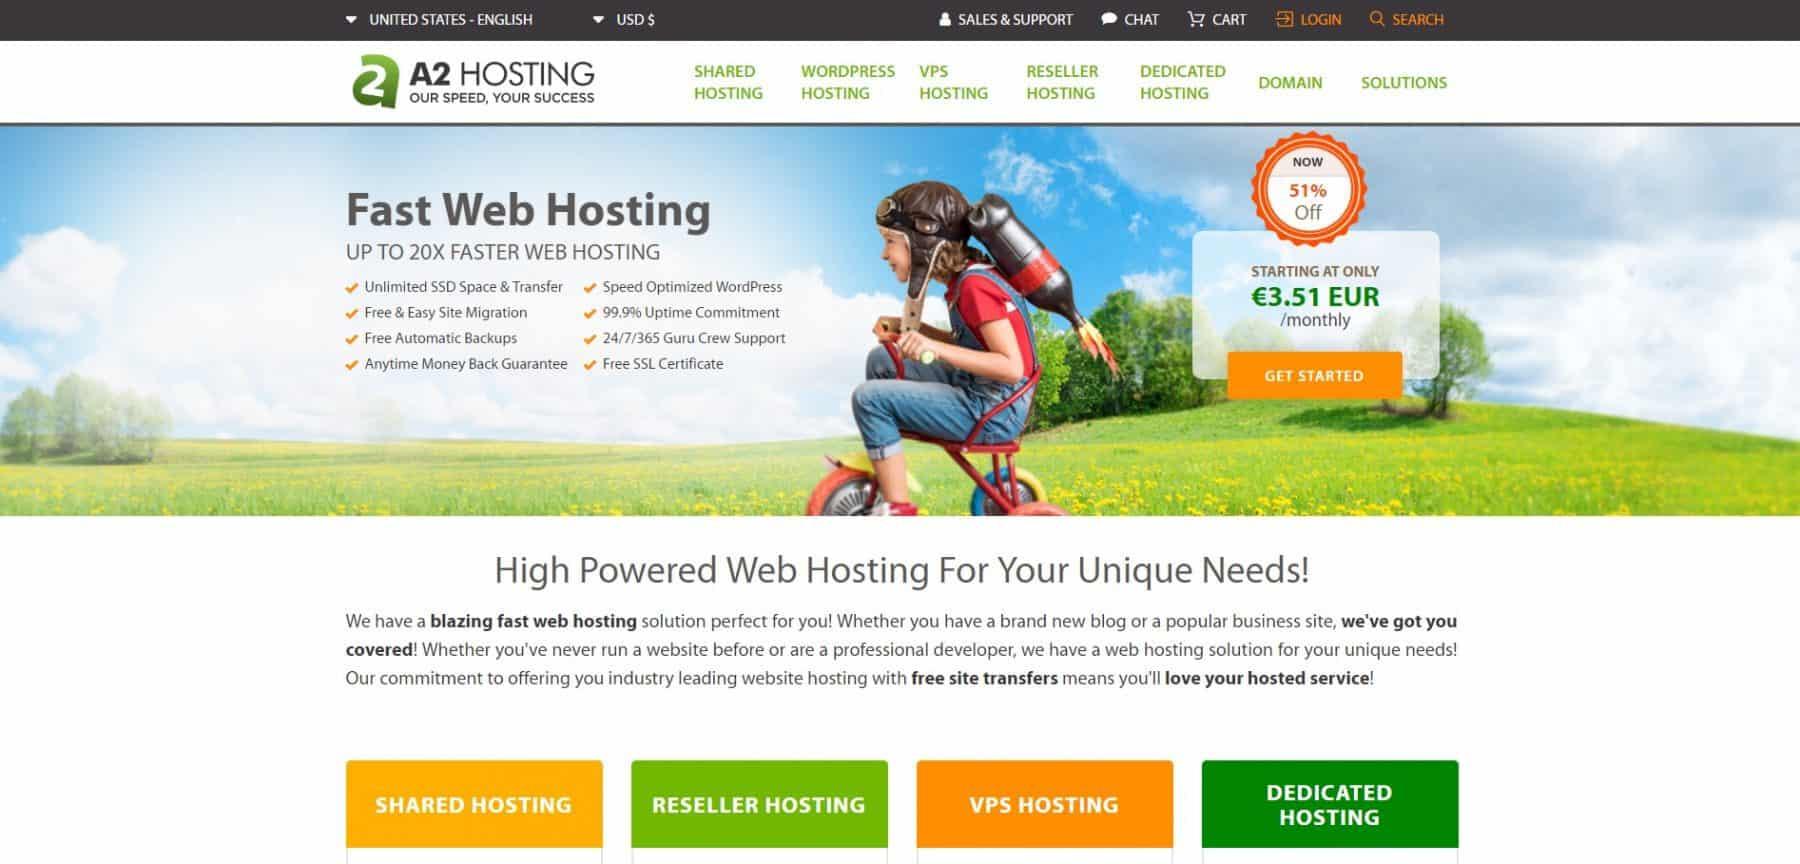 a2 hosting main july 19